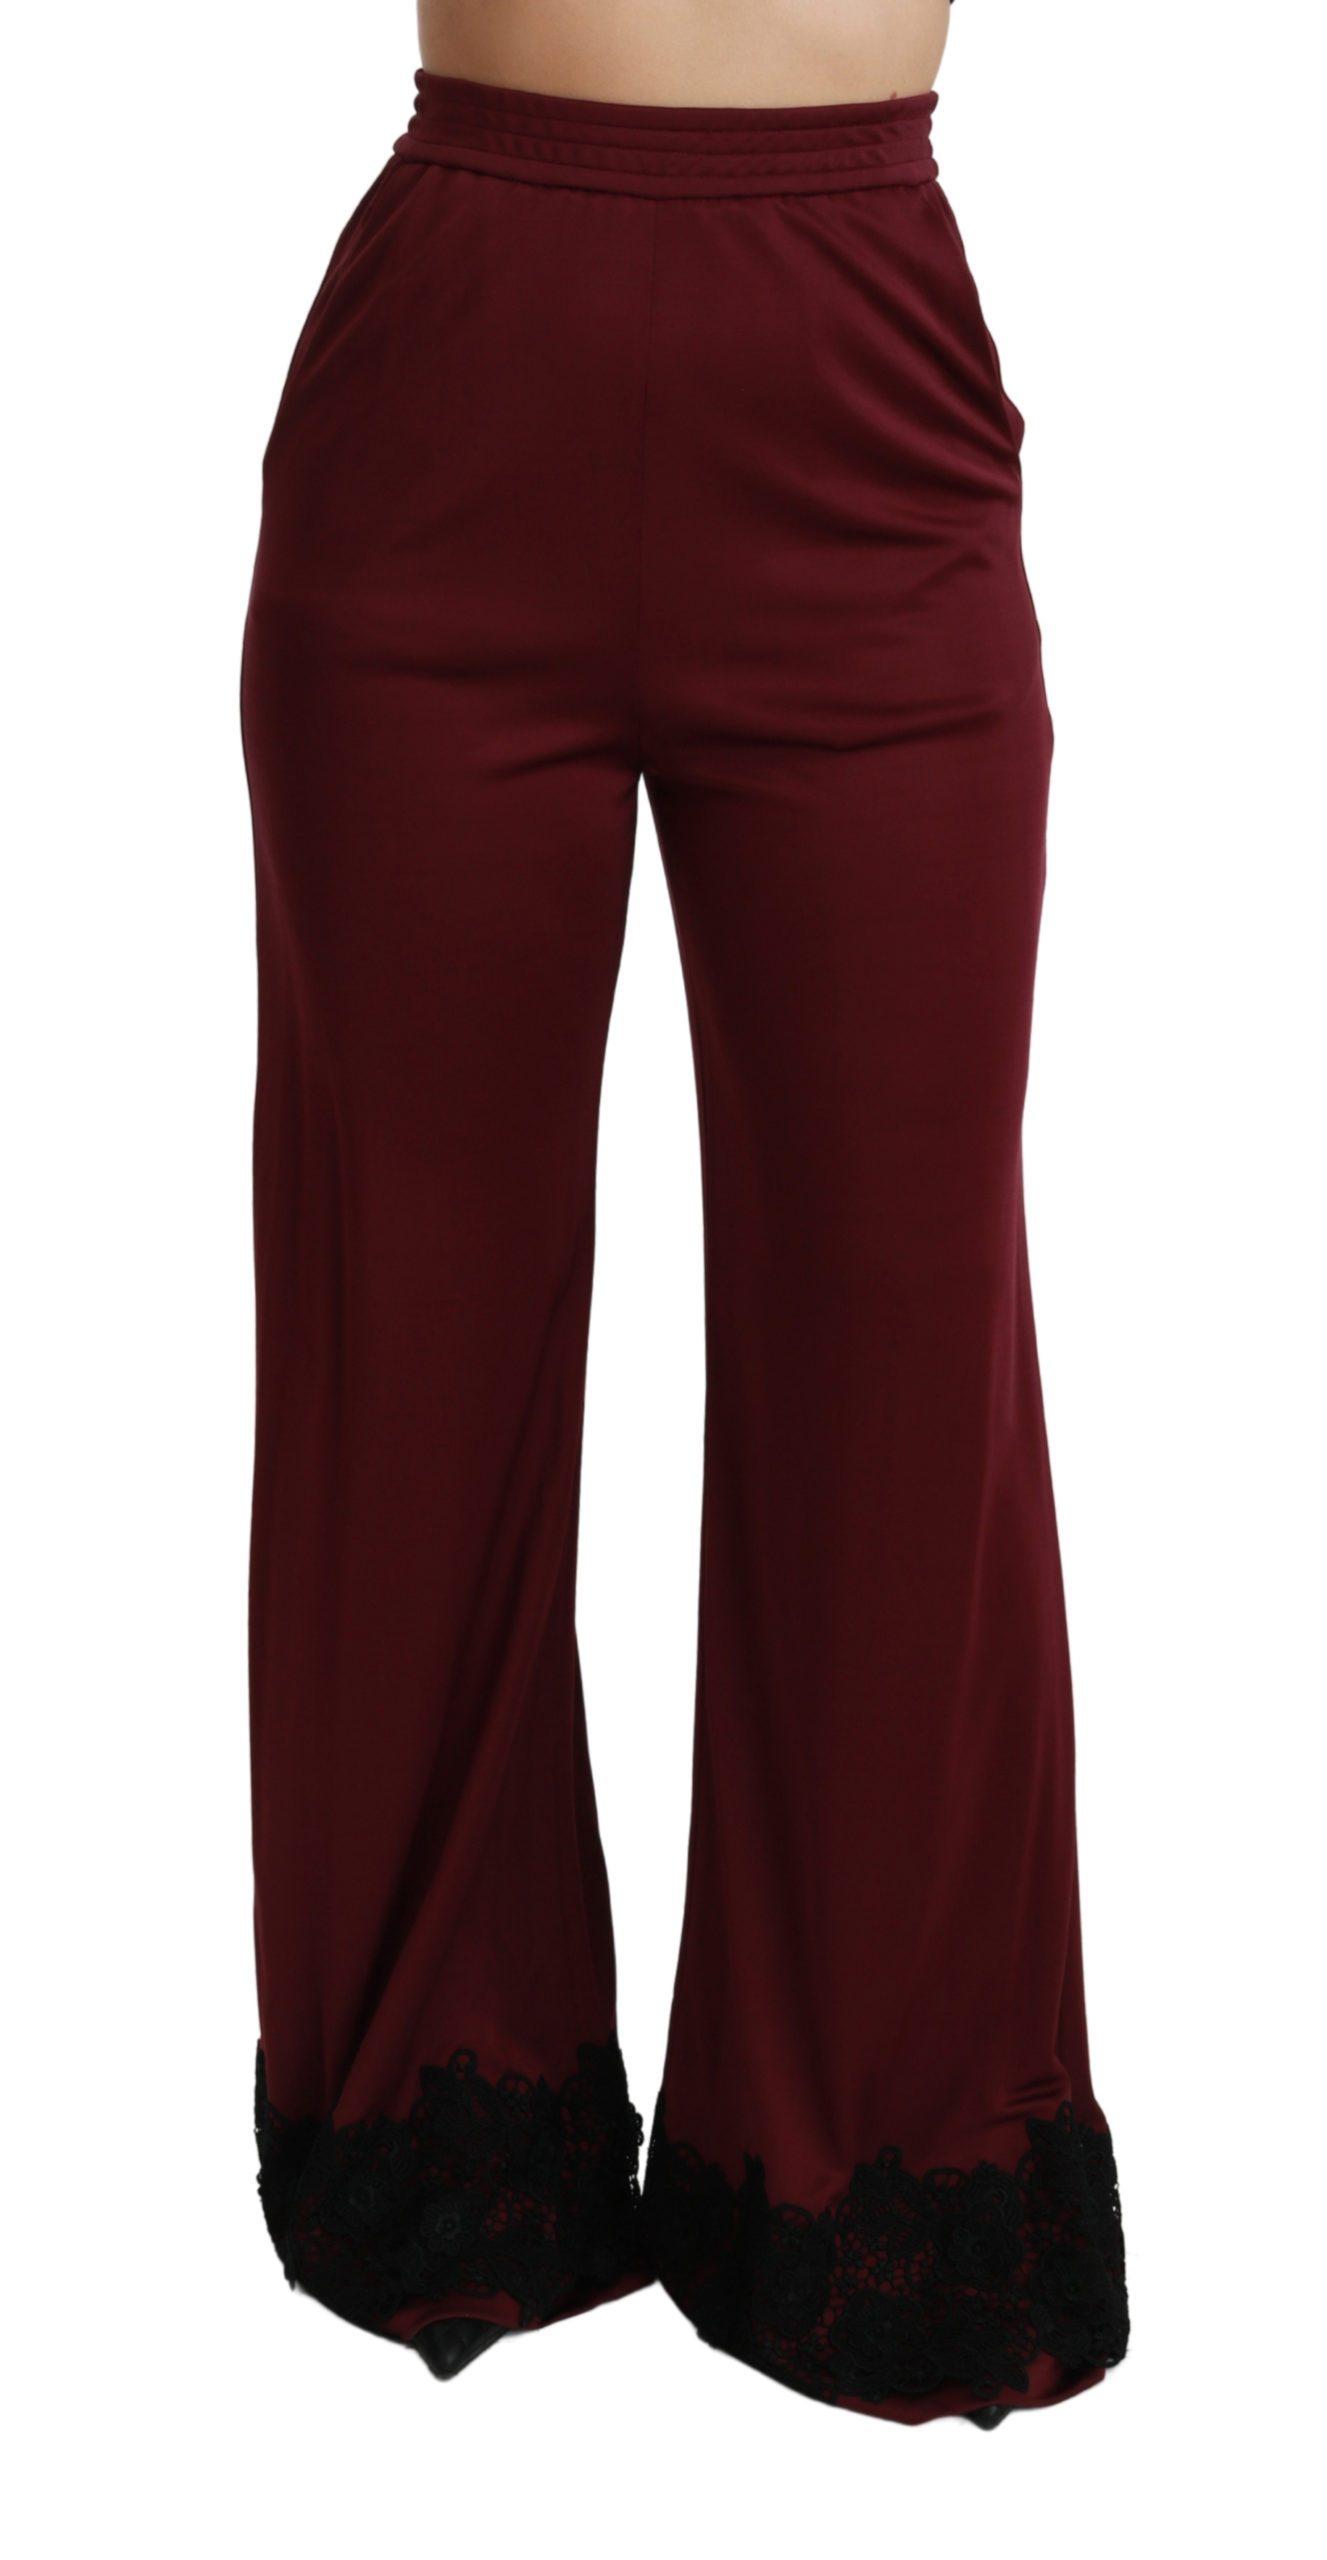 Dolce & Gabbana Women's Lace High Waist Trouser Bordeaux PAN70934 - IT40|S